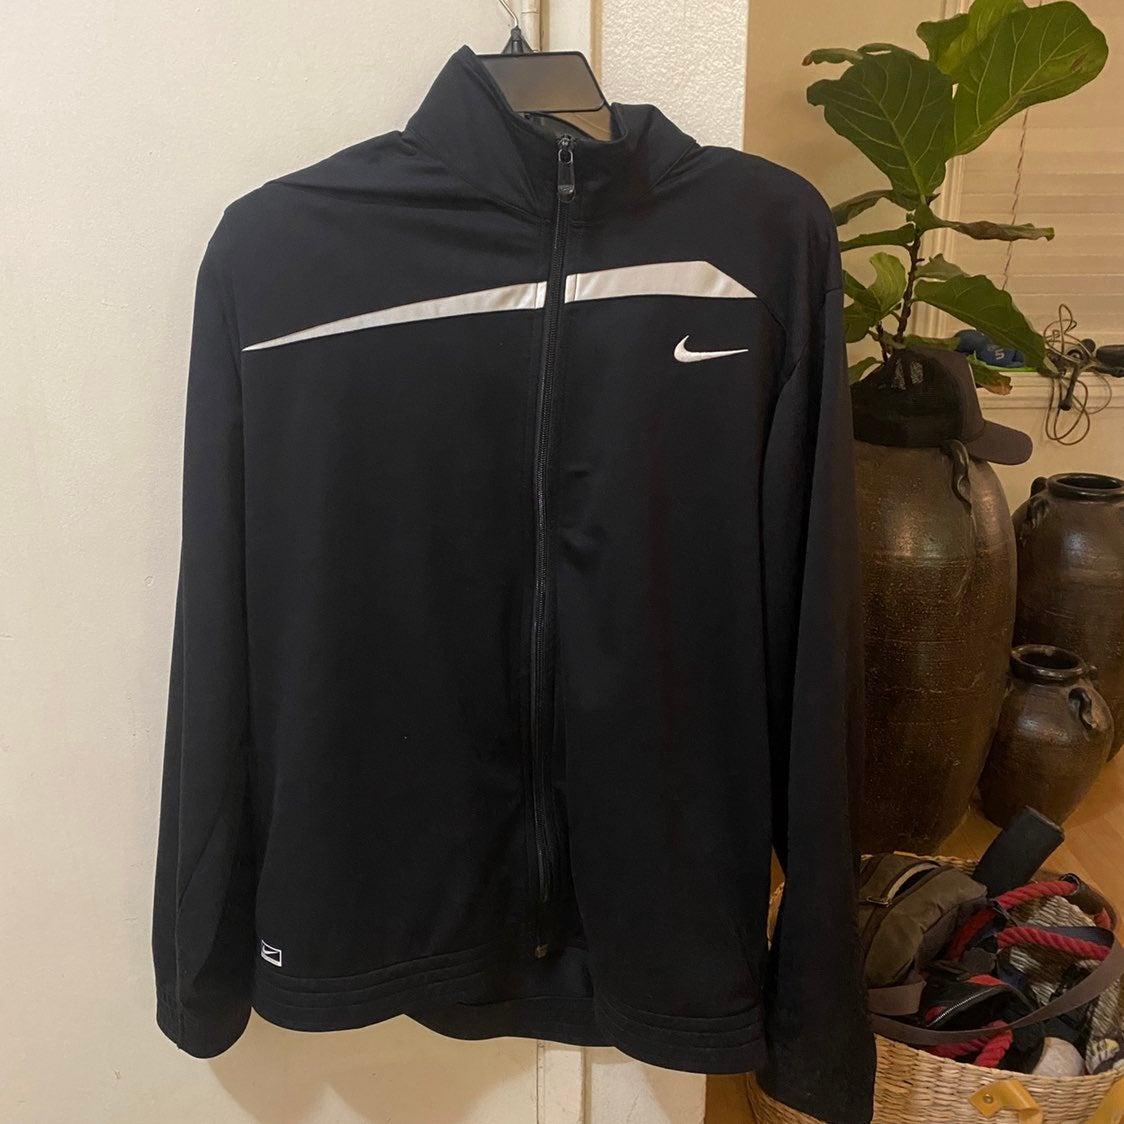 Large Nike Zip Jacket Sweater Basketball